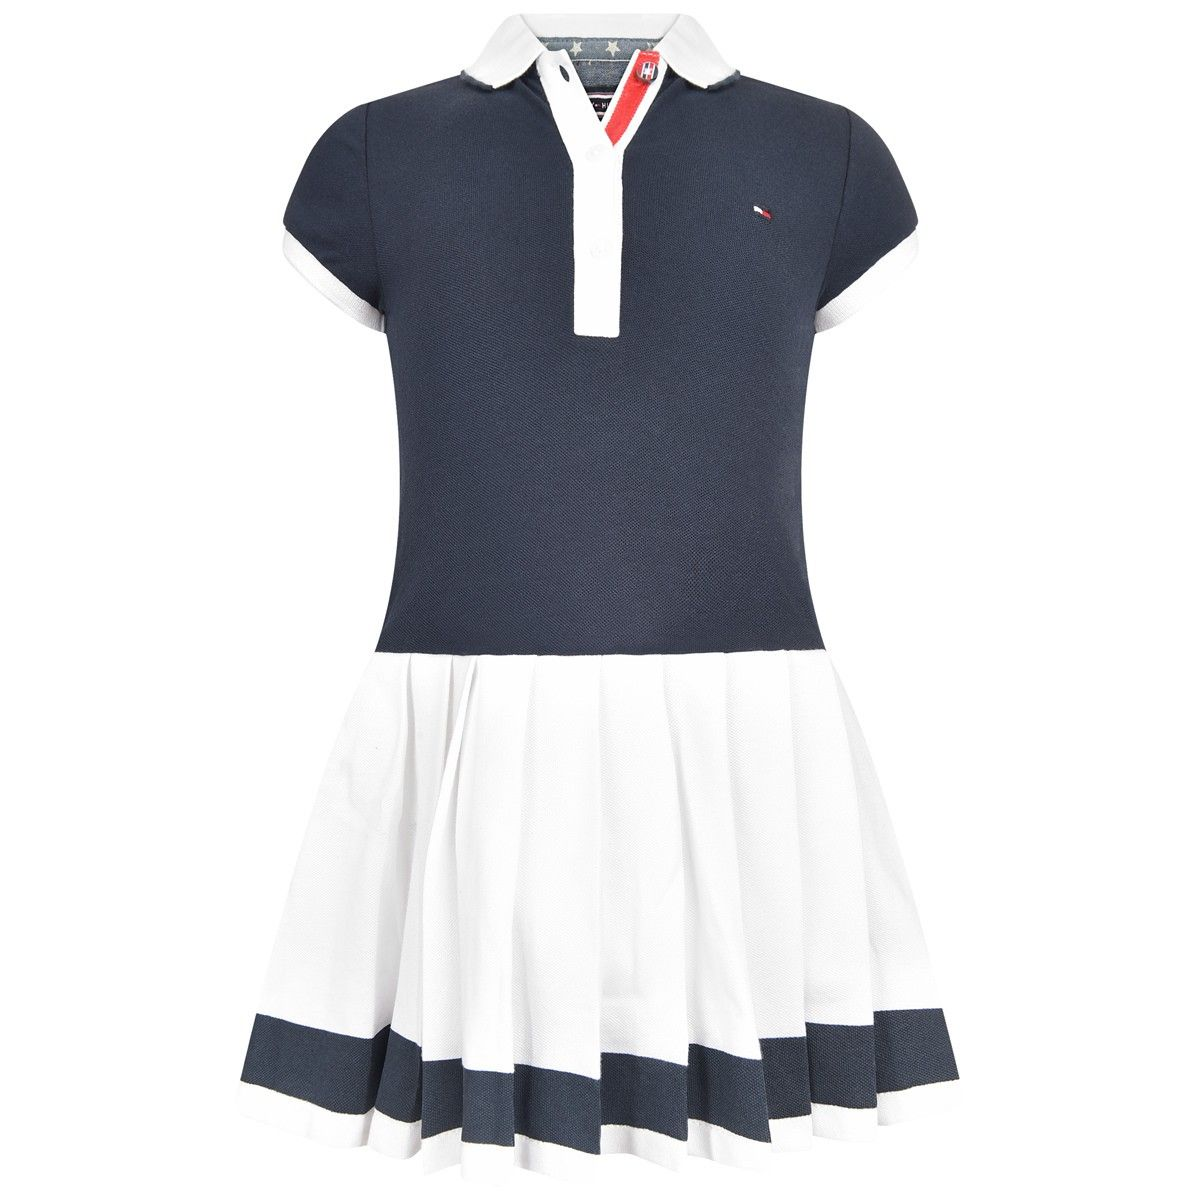 b3f4b1eb Tommy Hilfiger Girls Navy & White Polo Dress | Tommy Hilfiger SS16 ...